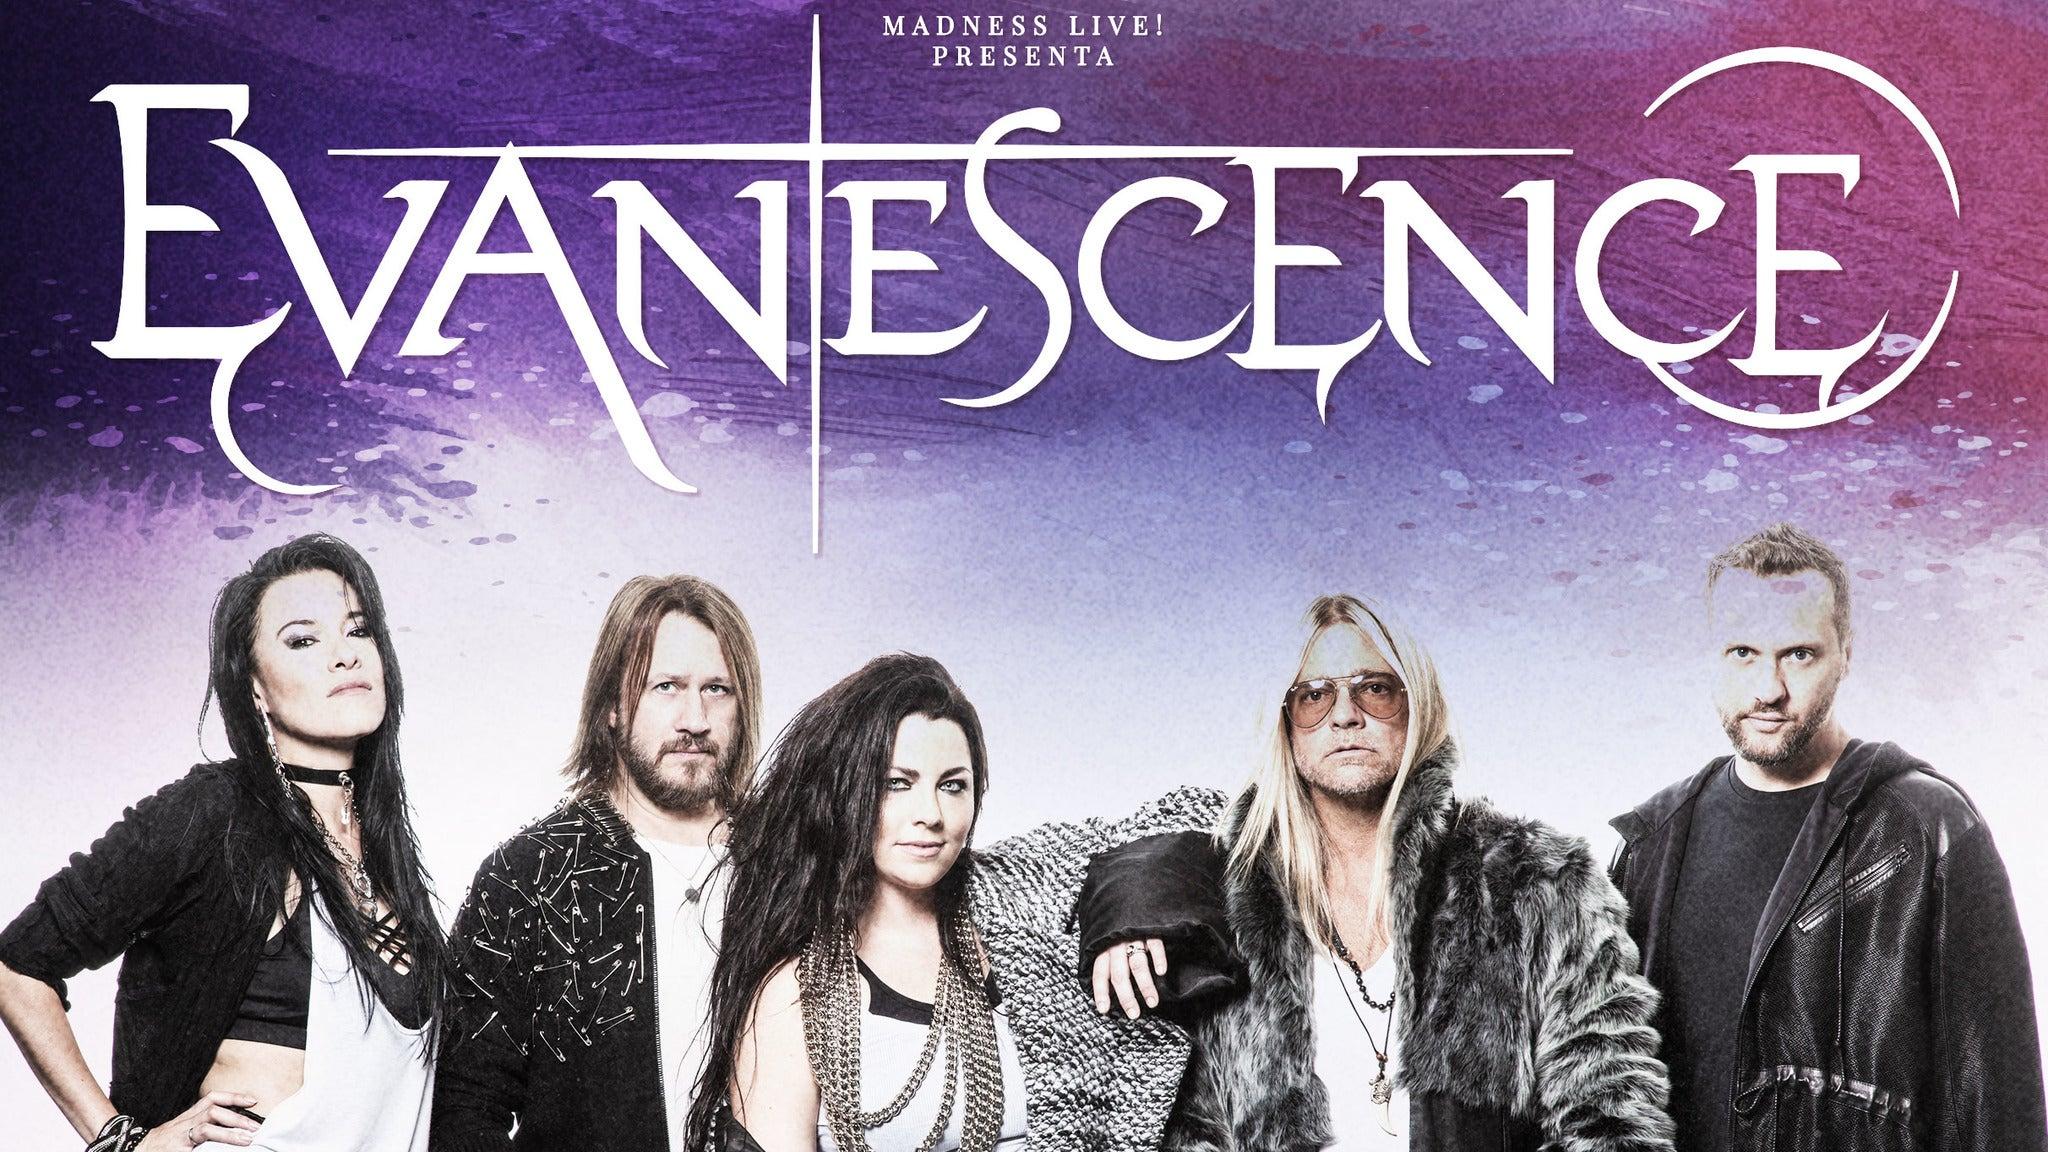 Evanescence + Halestorm at Gas South Arena